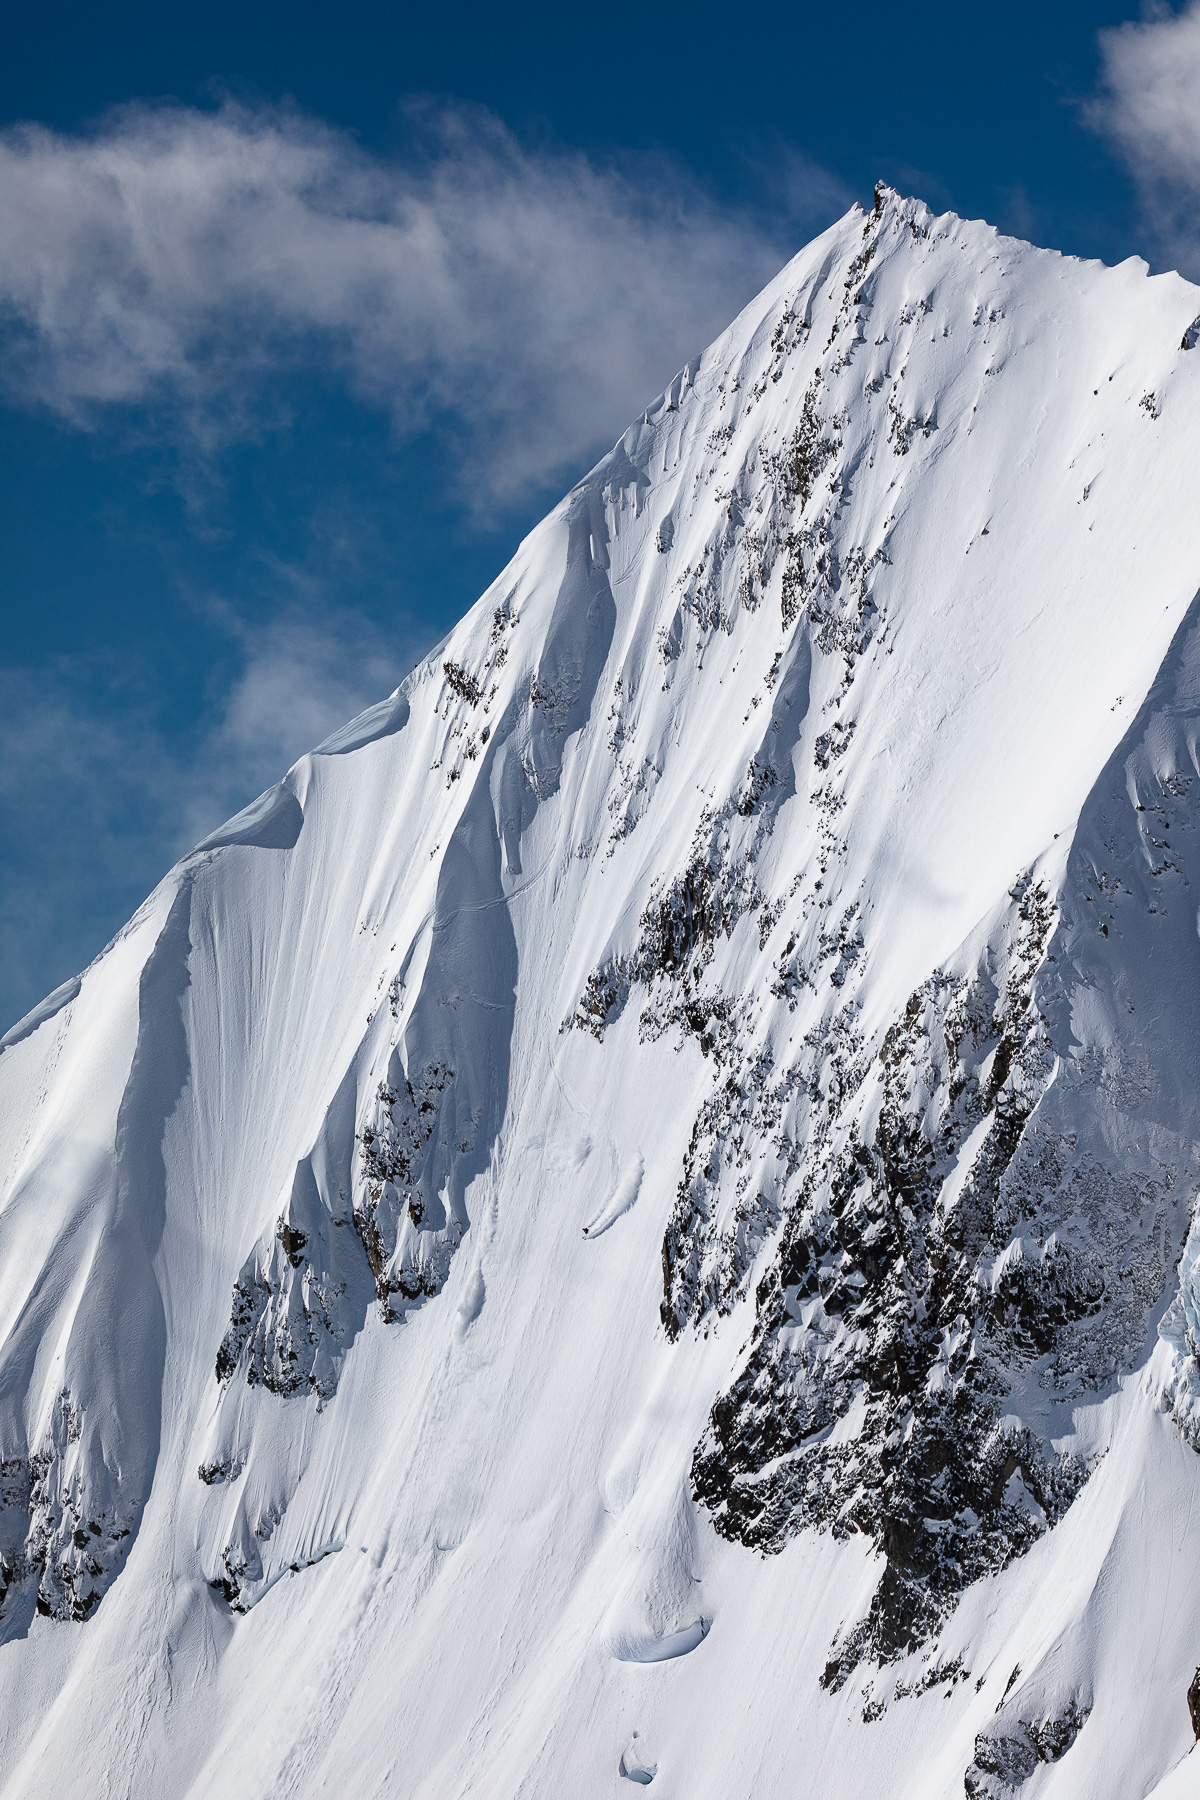 Skier/Shikaichi Ueki Location/Squamish、BC、CAN